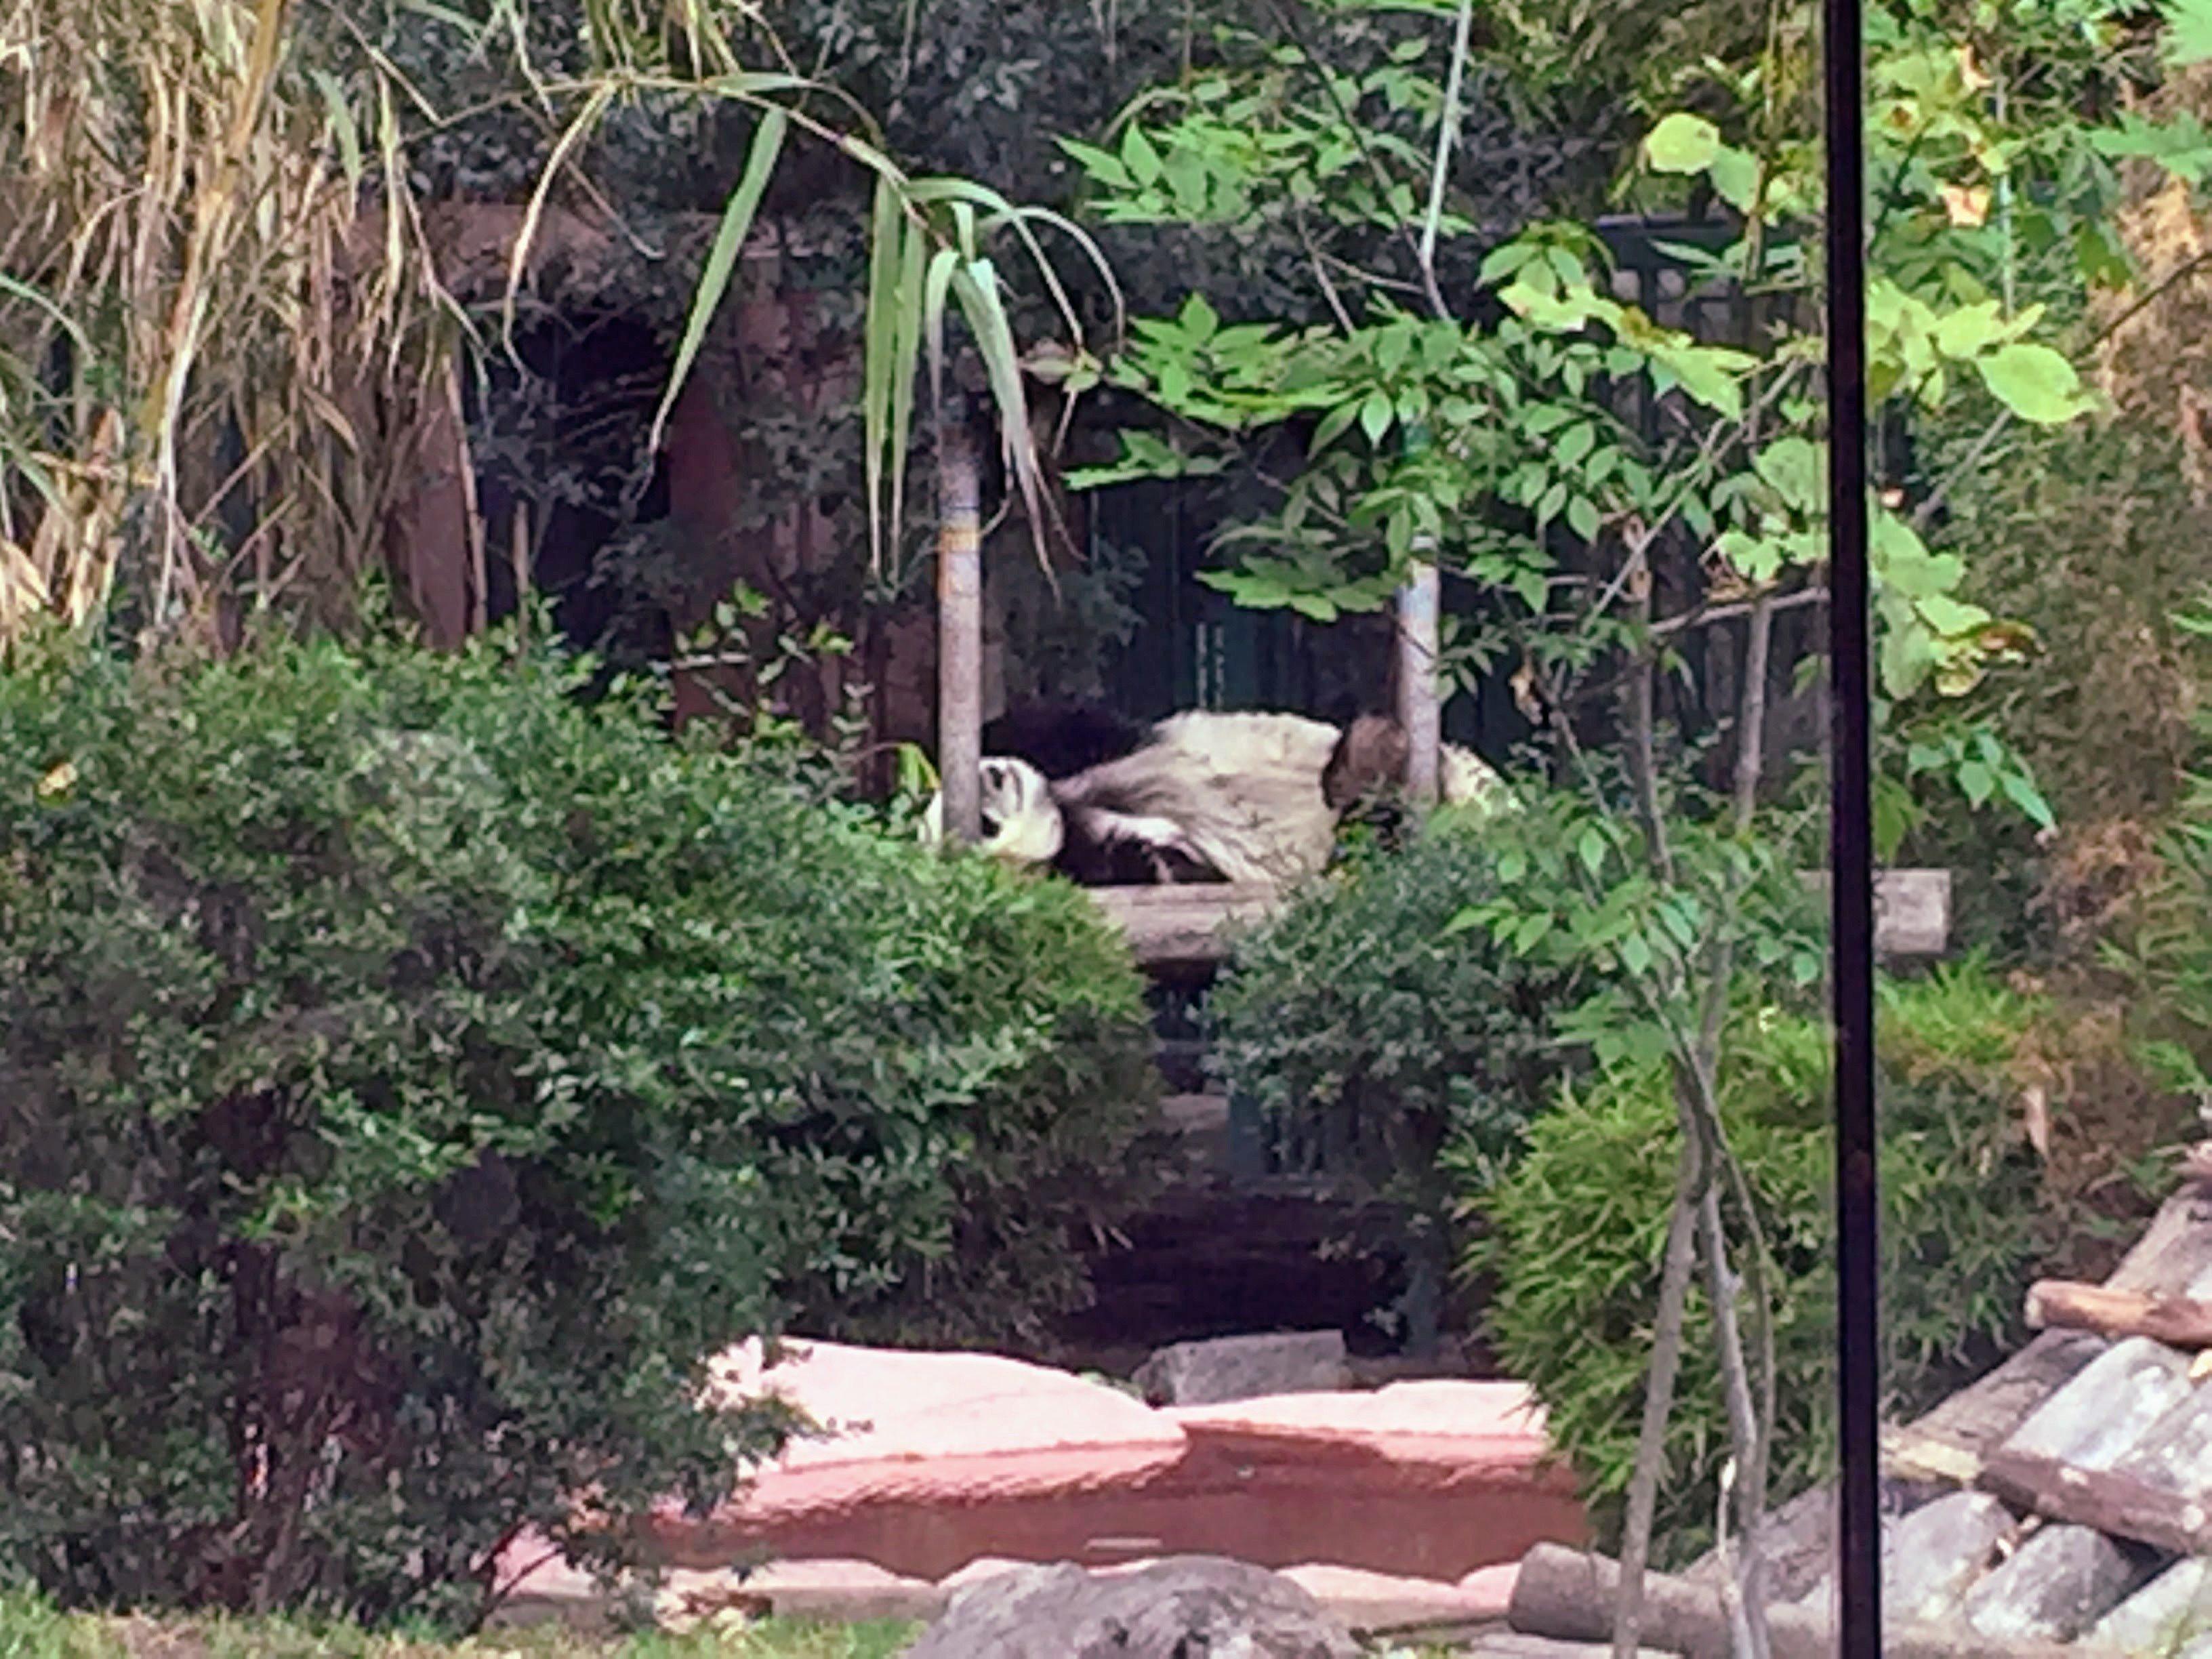 pandas at the zoo in Chapultepec Park